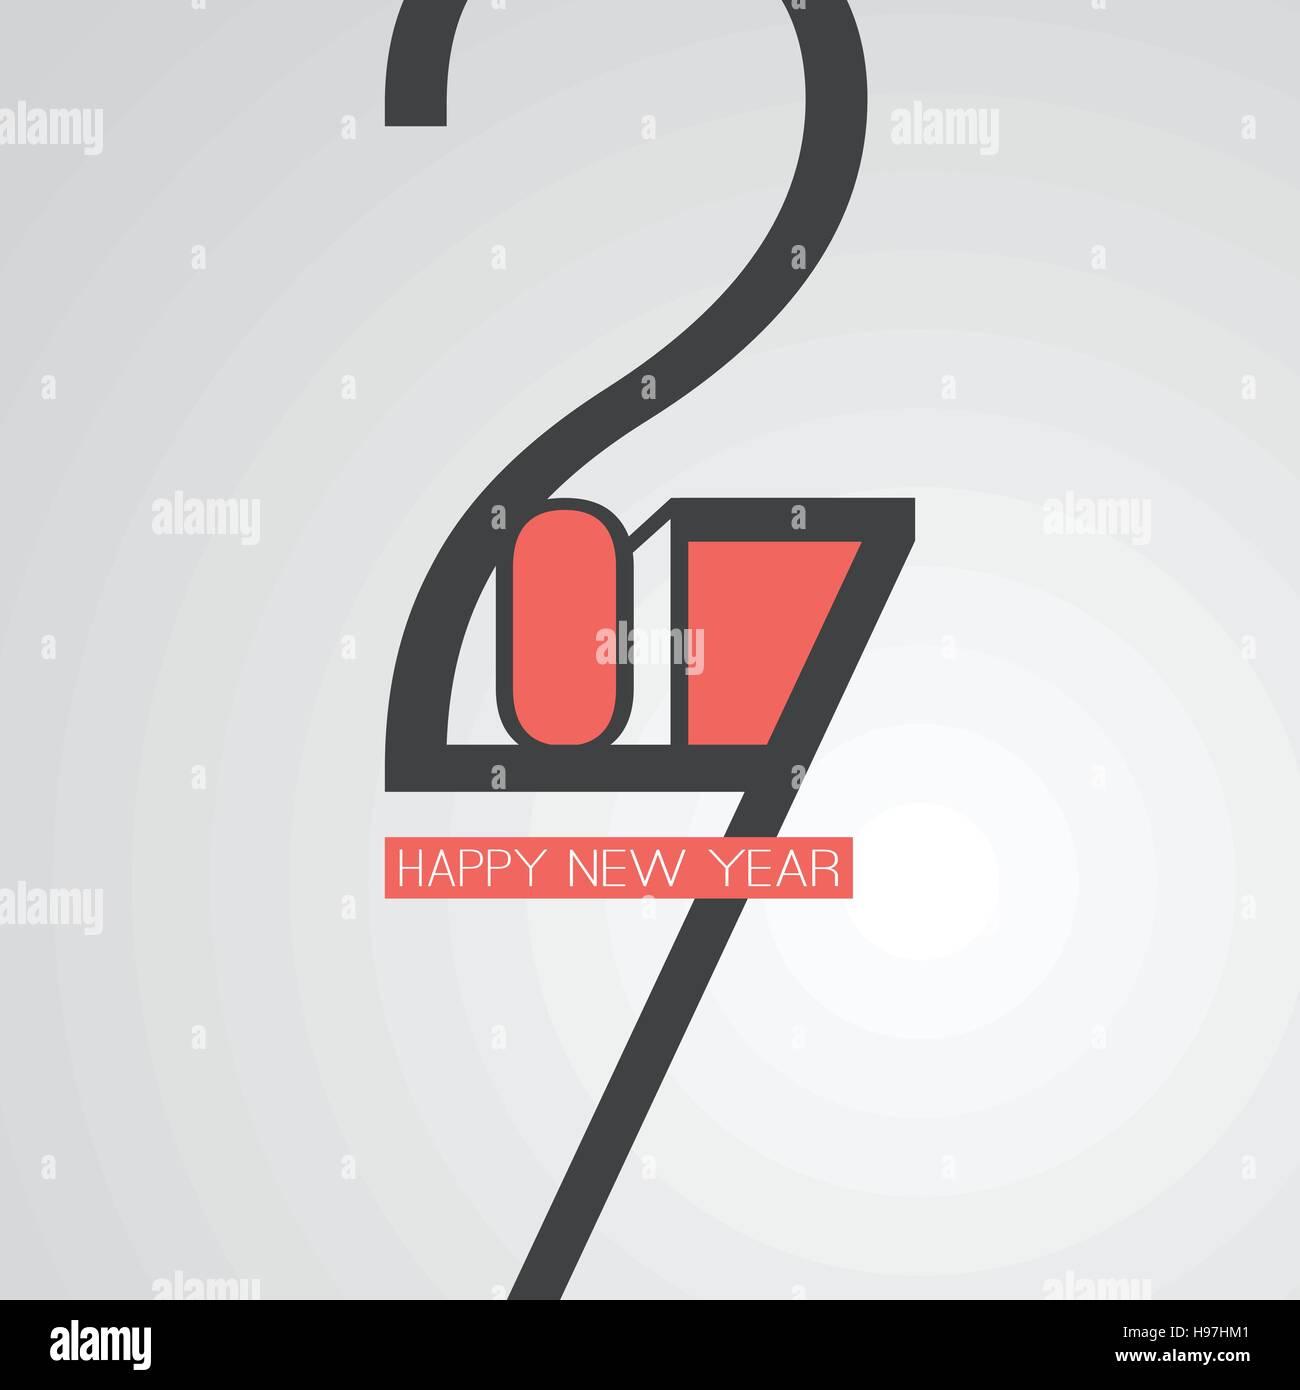 2017 Simple Design Red Black Stockfotos & 2017 Simple Design Red ...